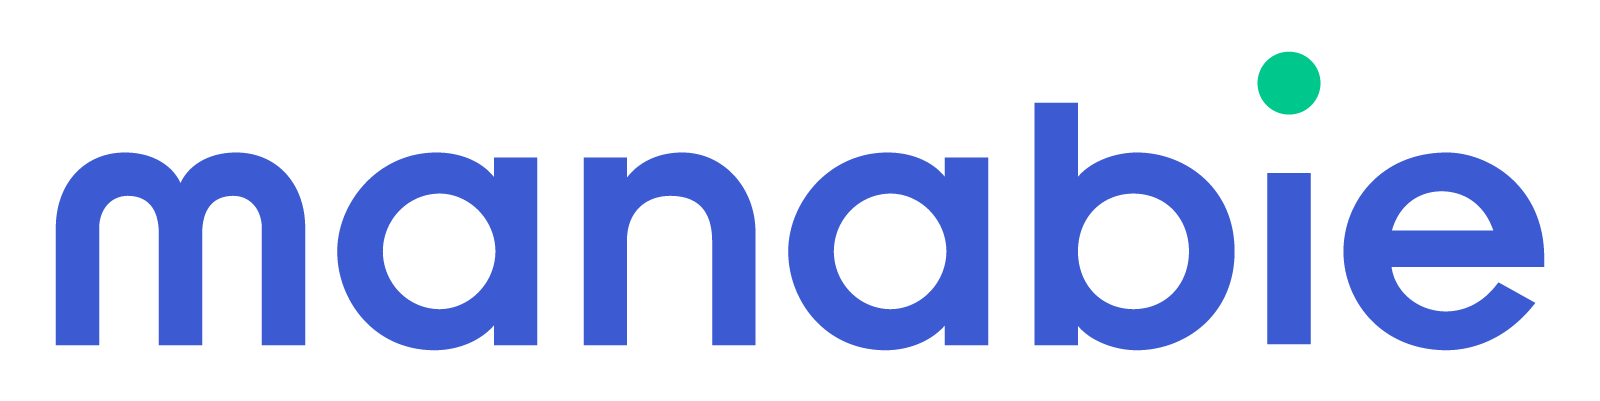 Manabie